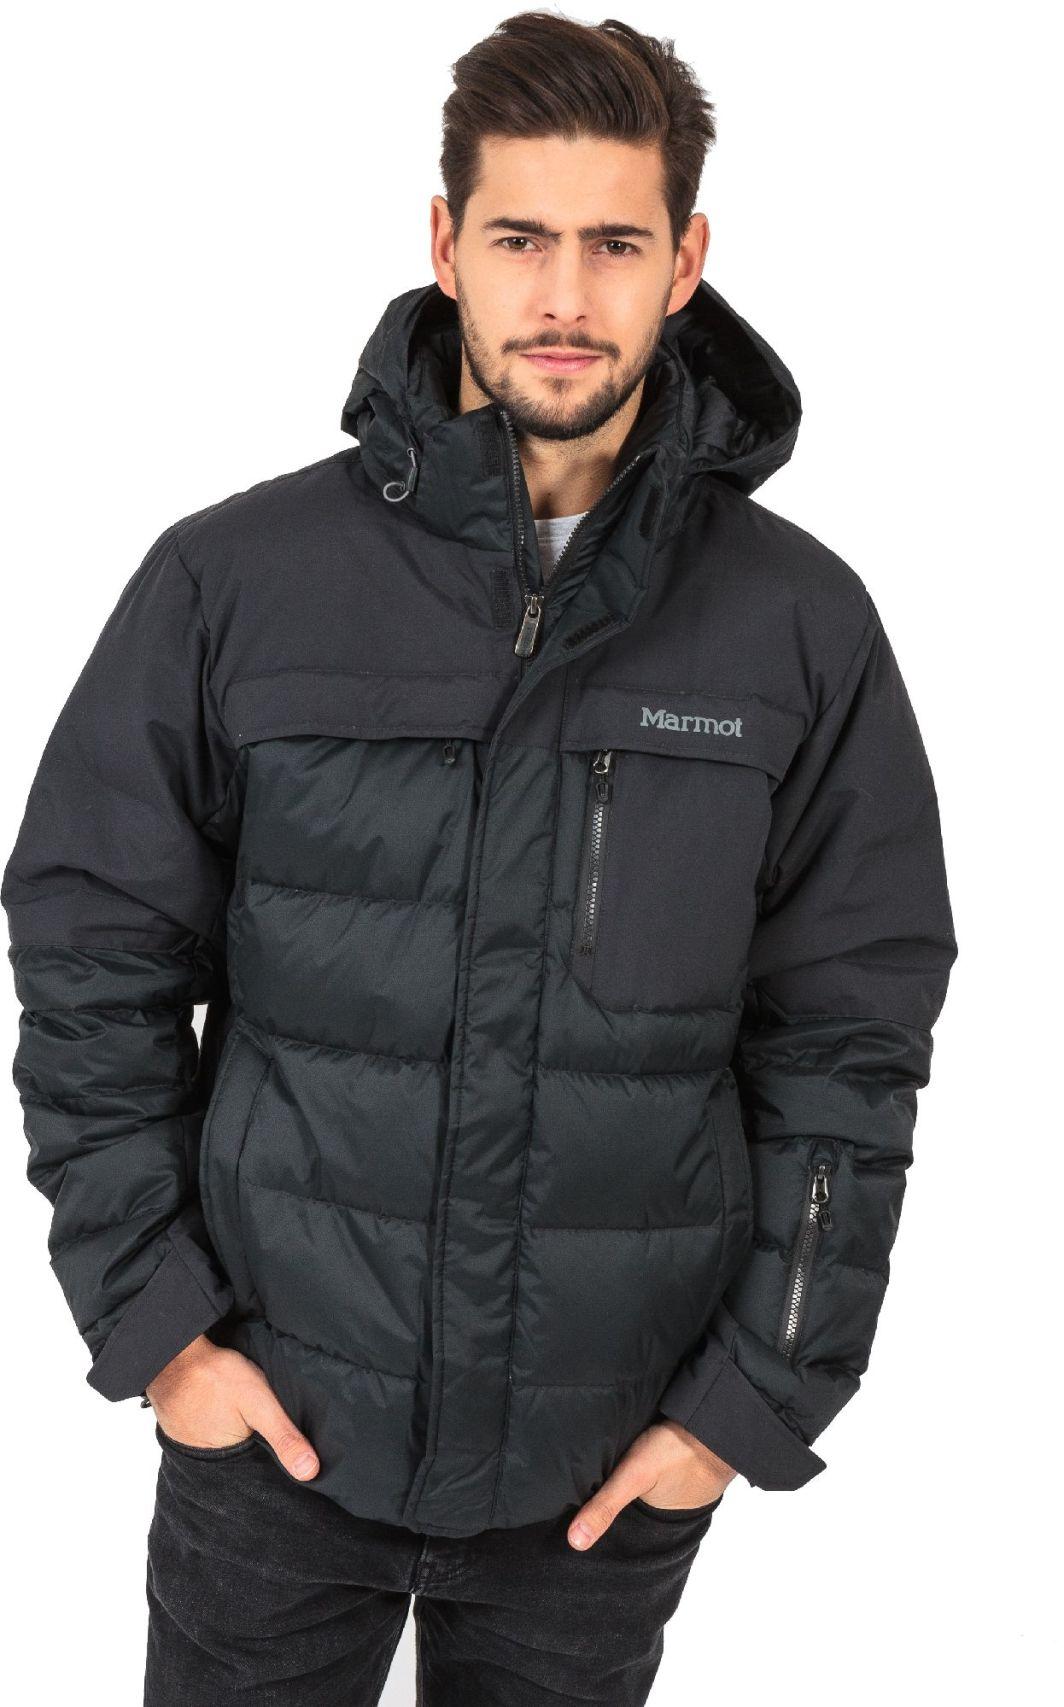 kurtka zimowa z puchu naturalnego szara 8082